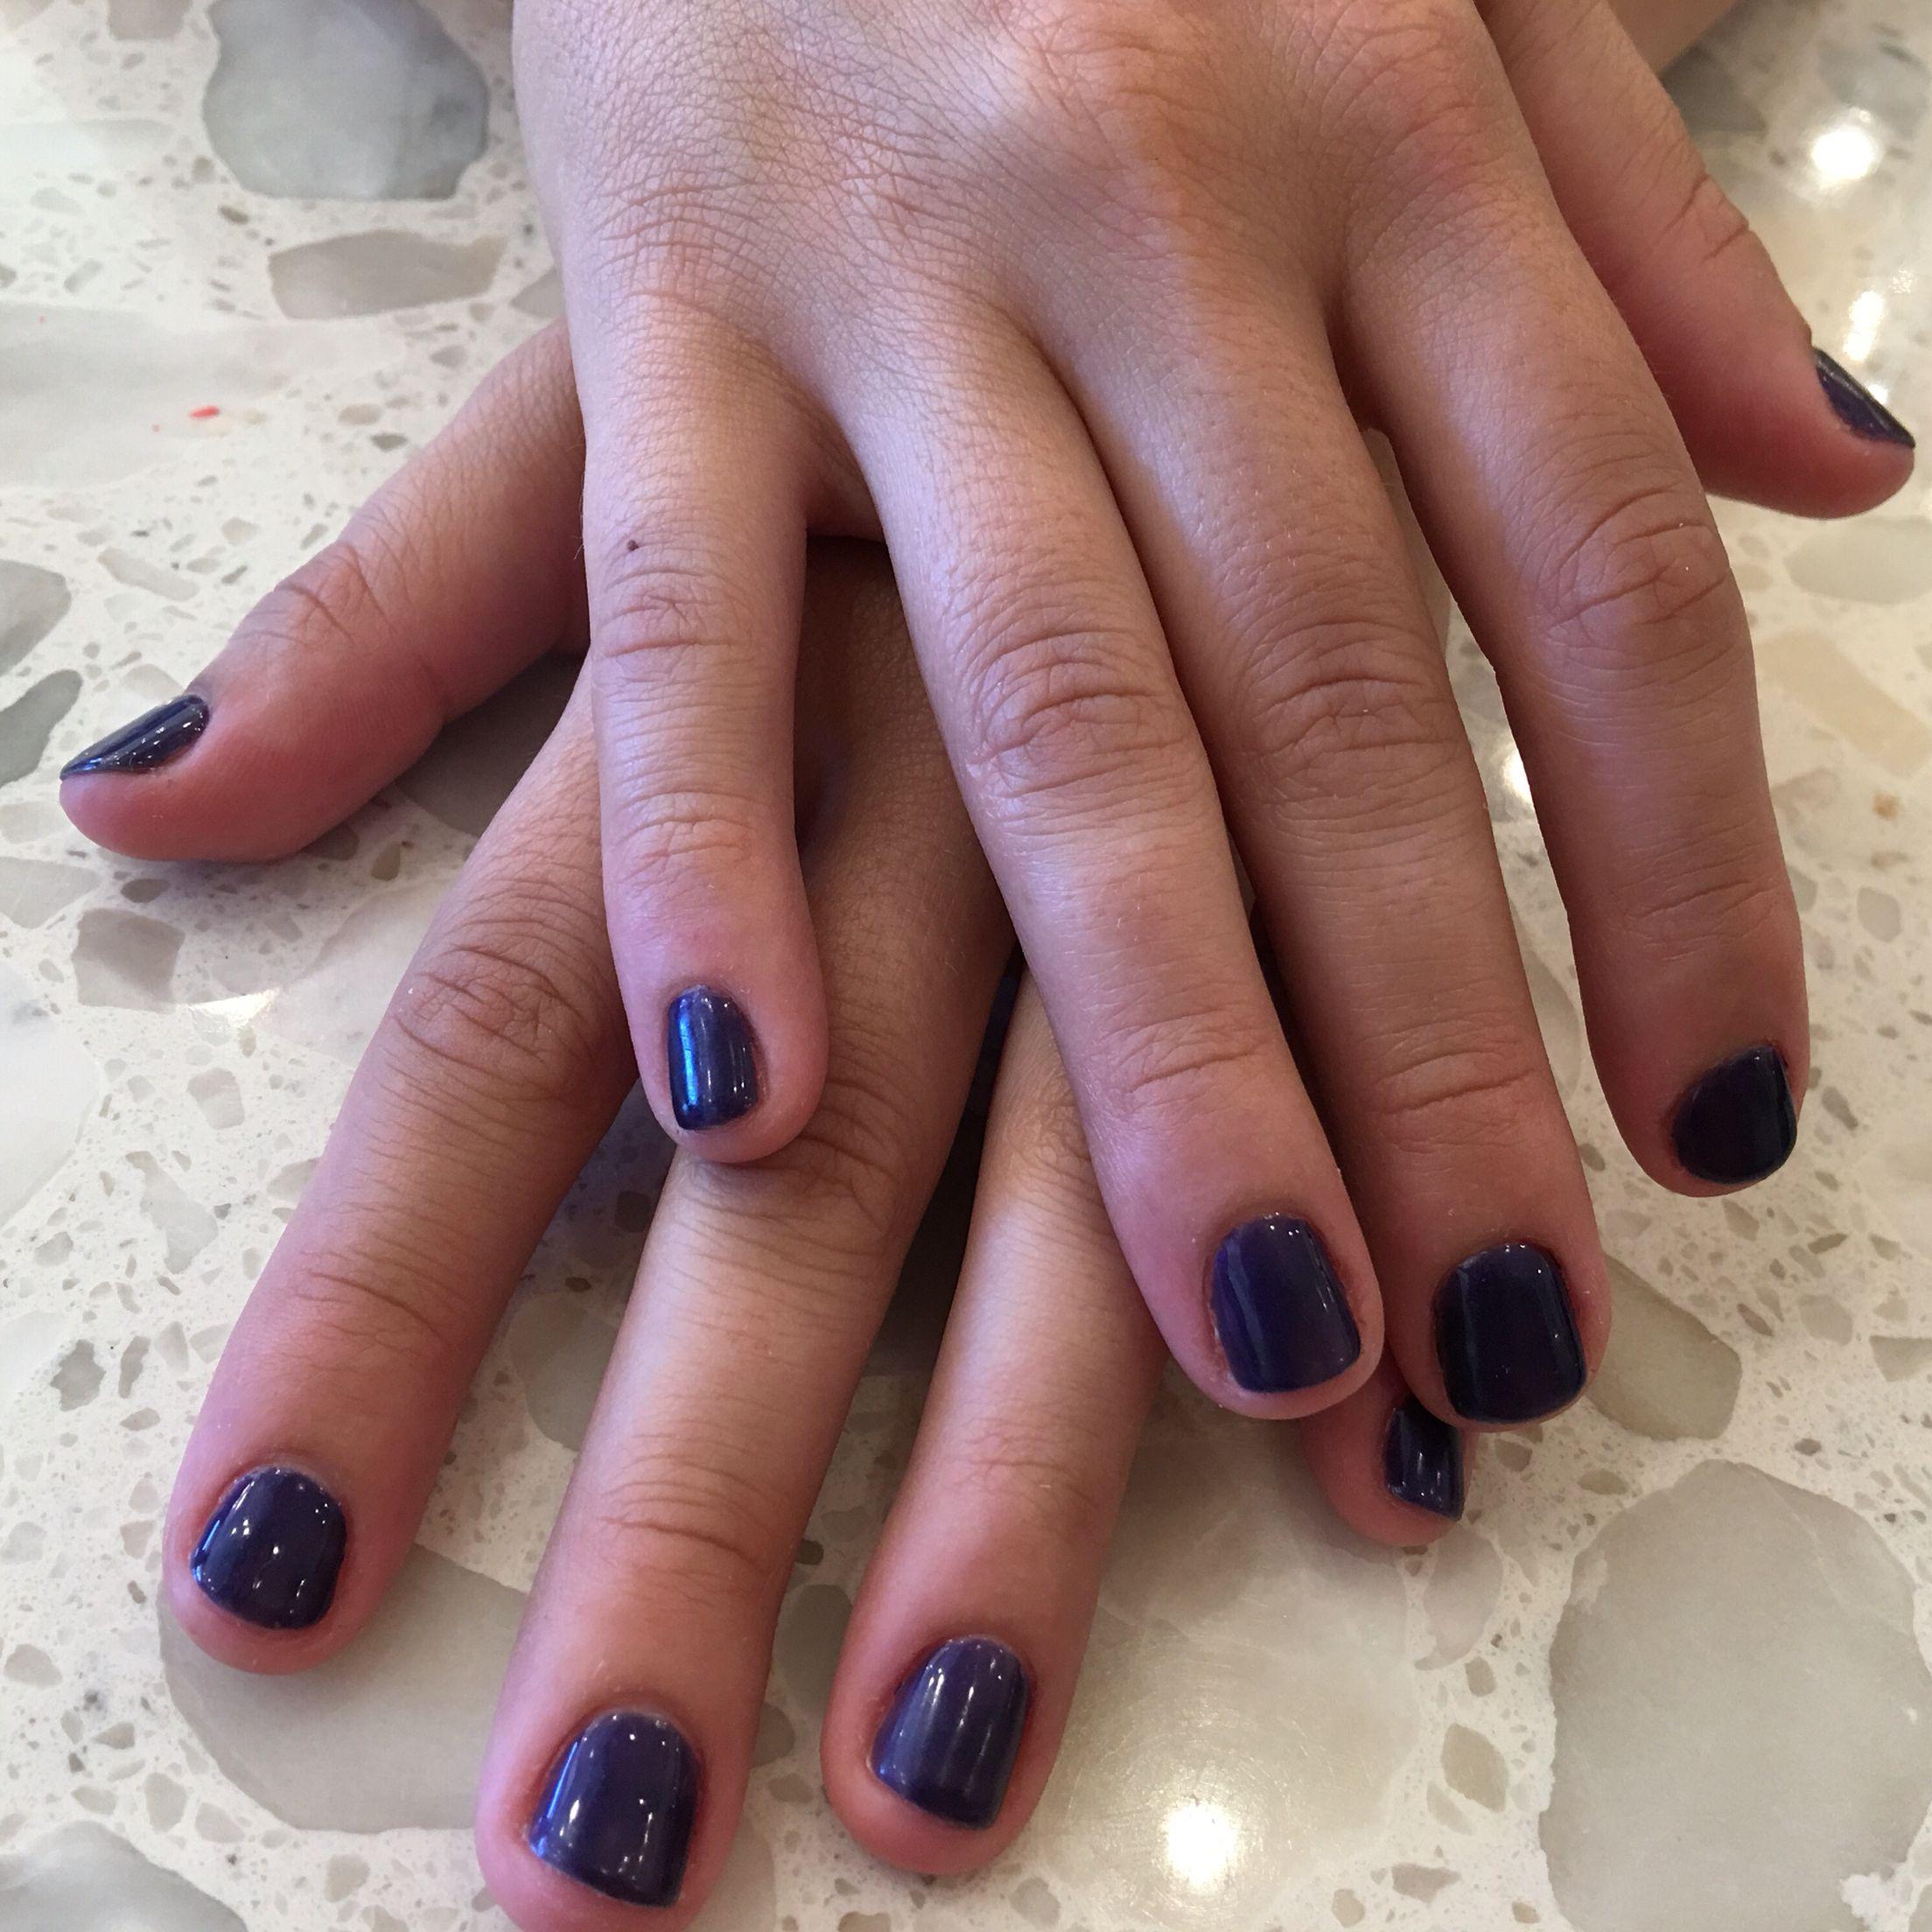 Antoinette By Cacee Gelcolor Gelpolish Gelmani Gelnails Cacee Envynailspaclt Southwestcharlotte Gel Nails Gel Color Nail Spa